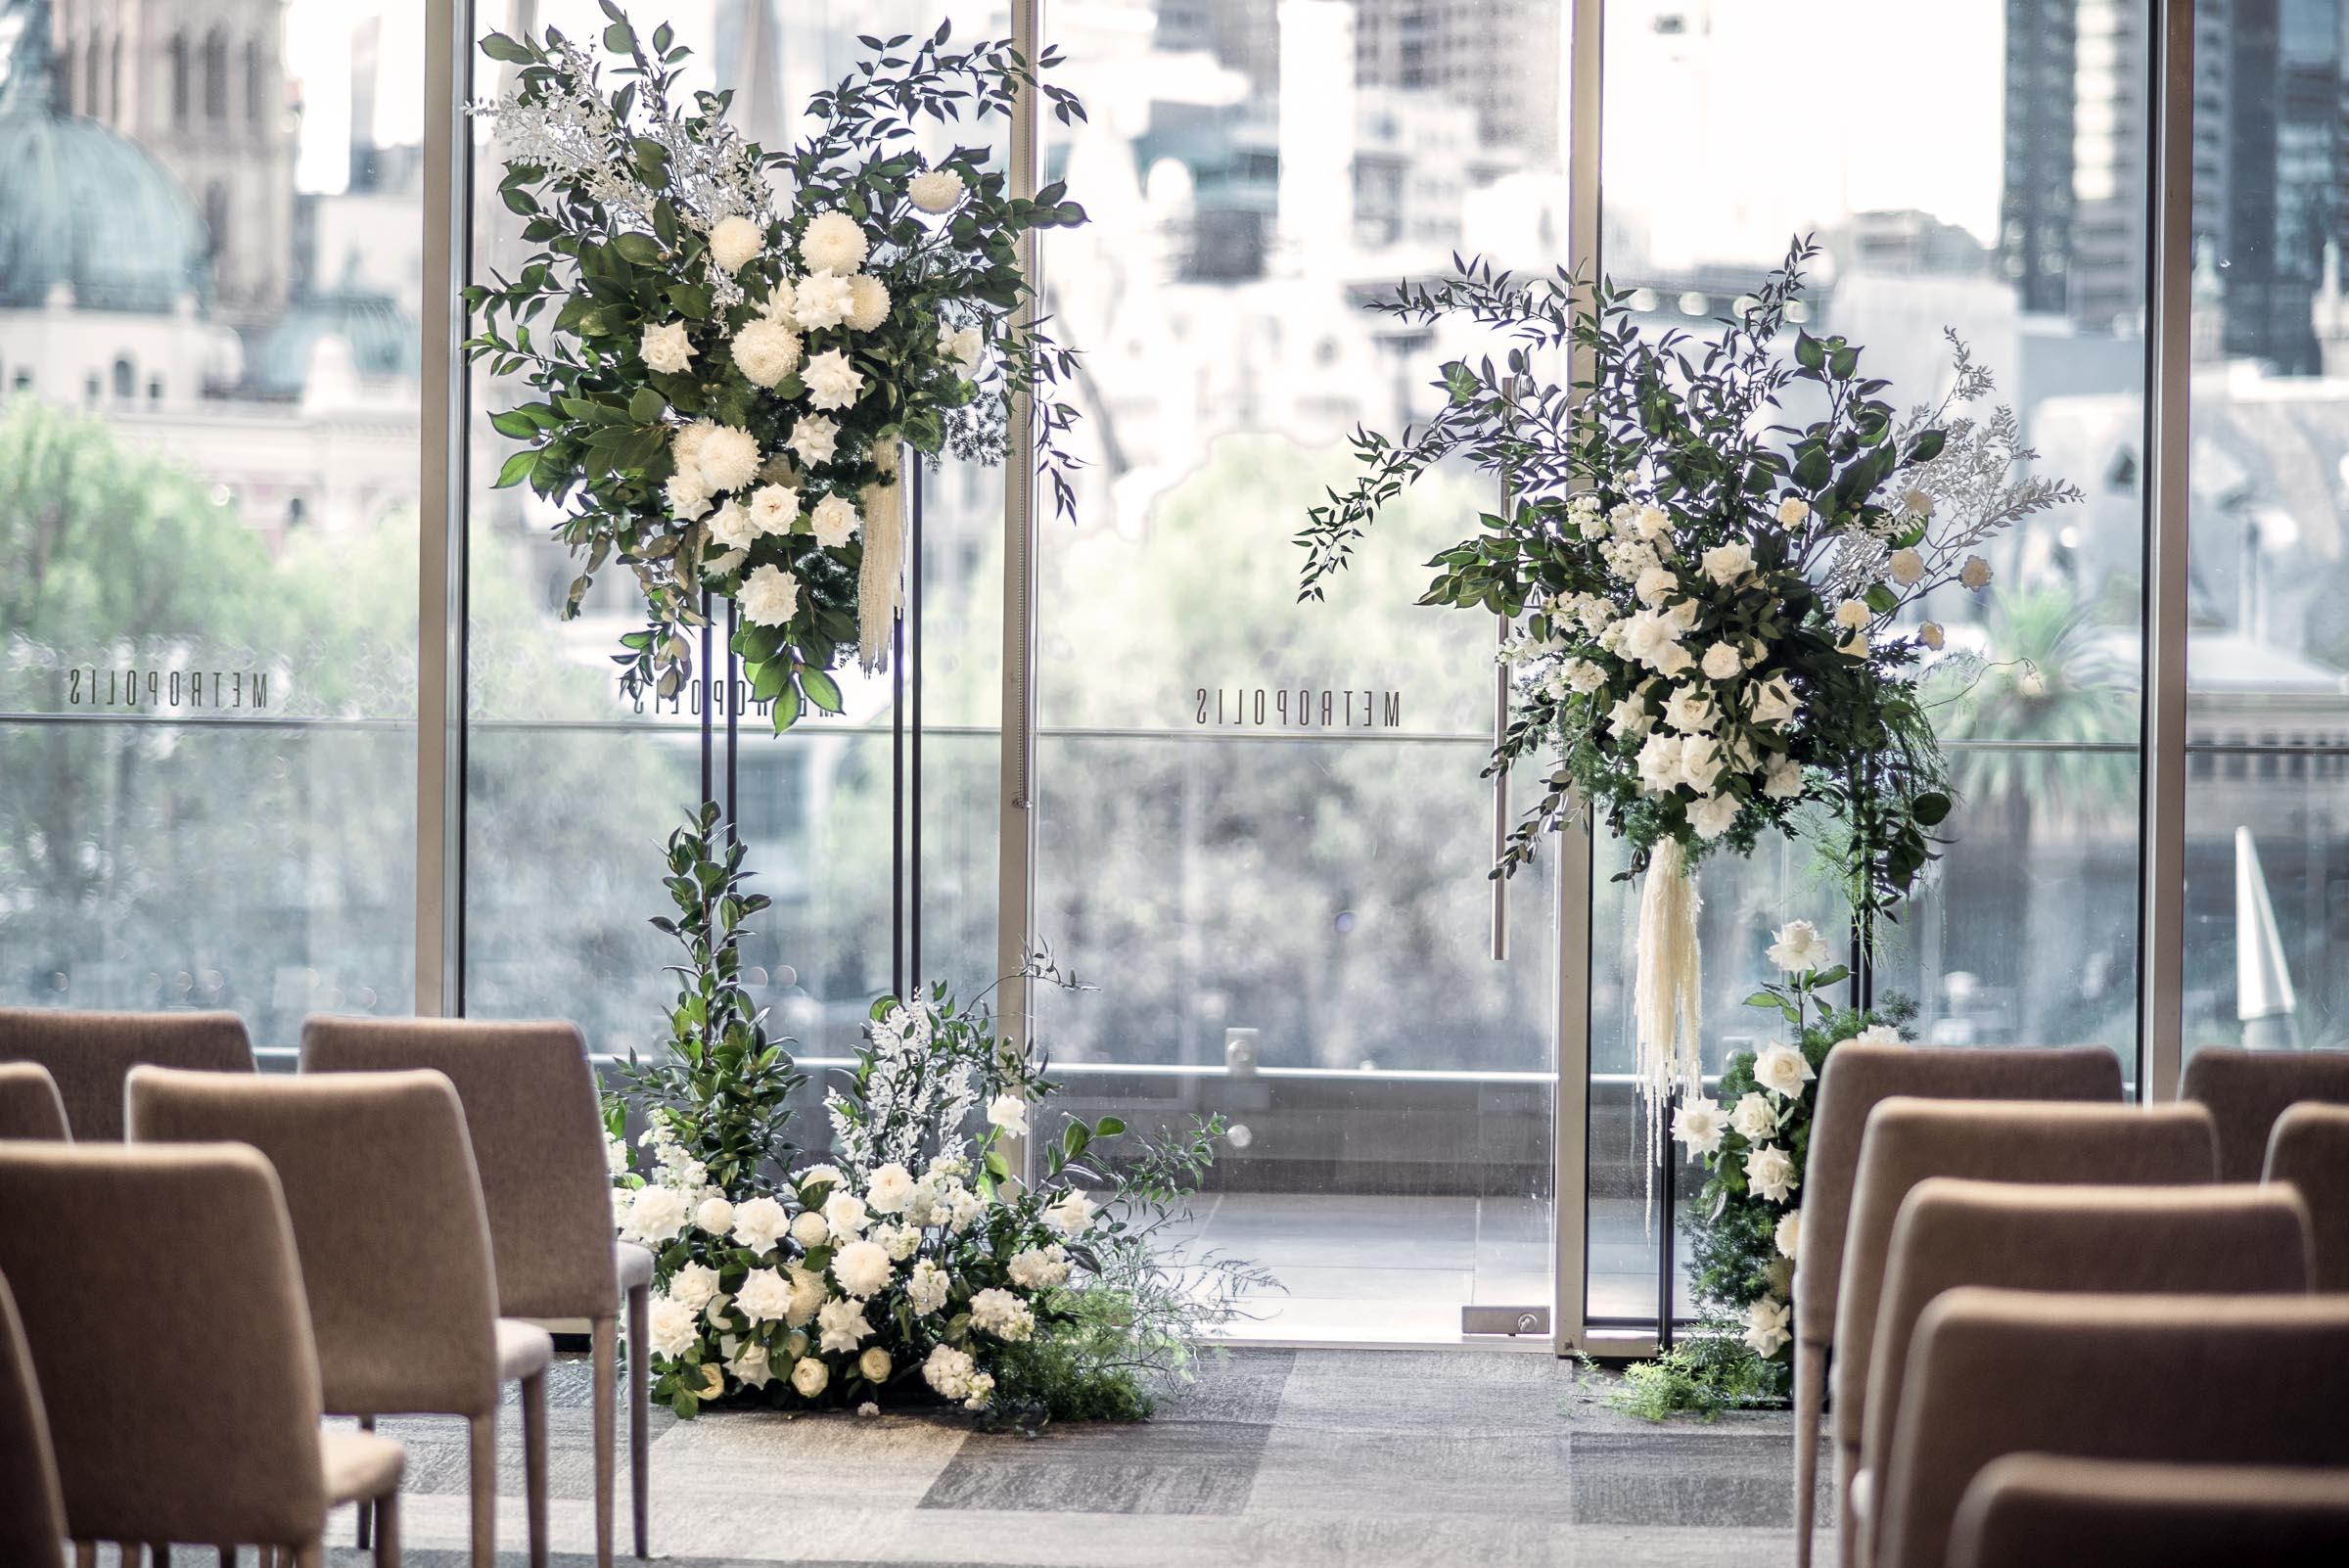 White & green ceremony flowers